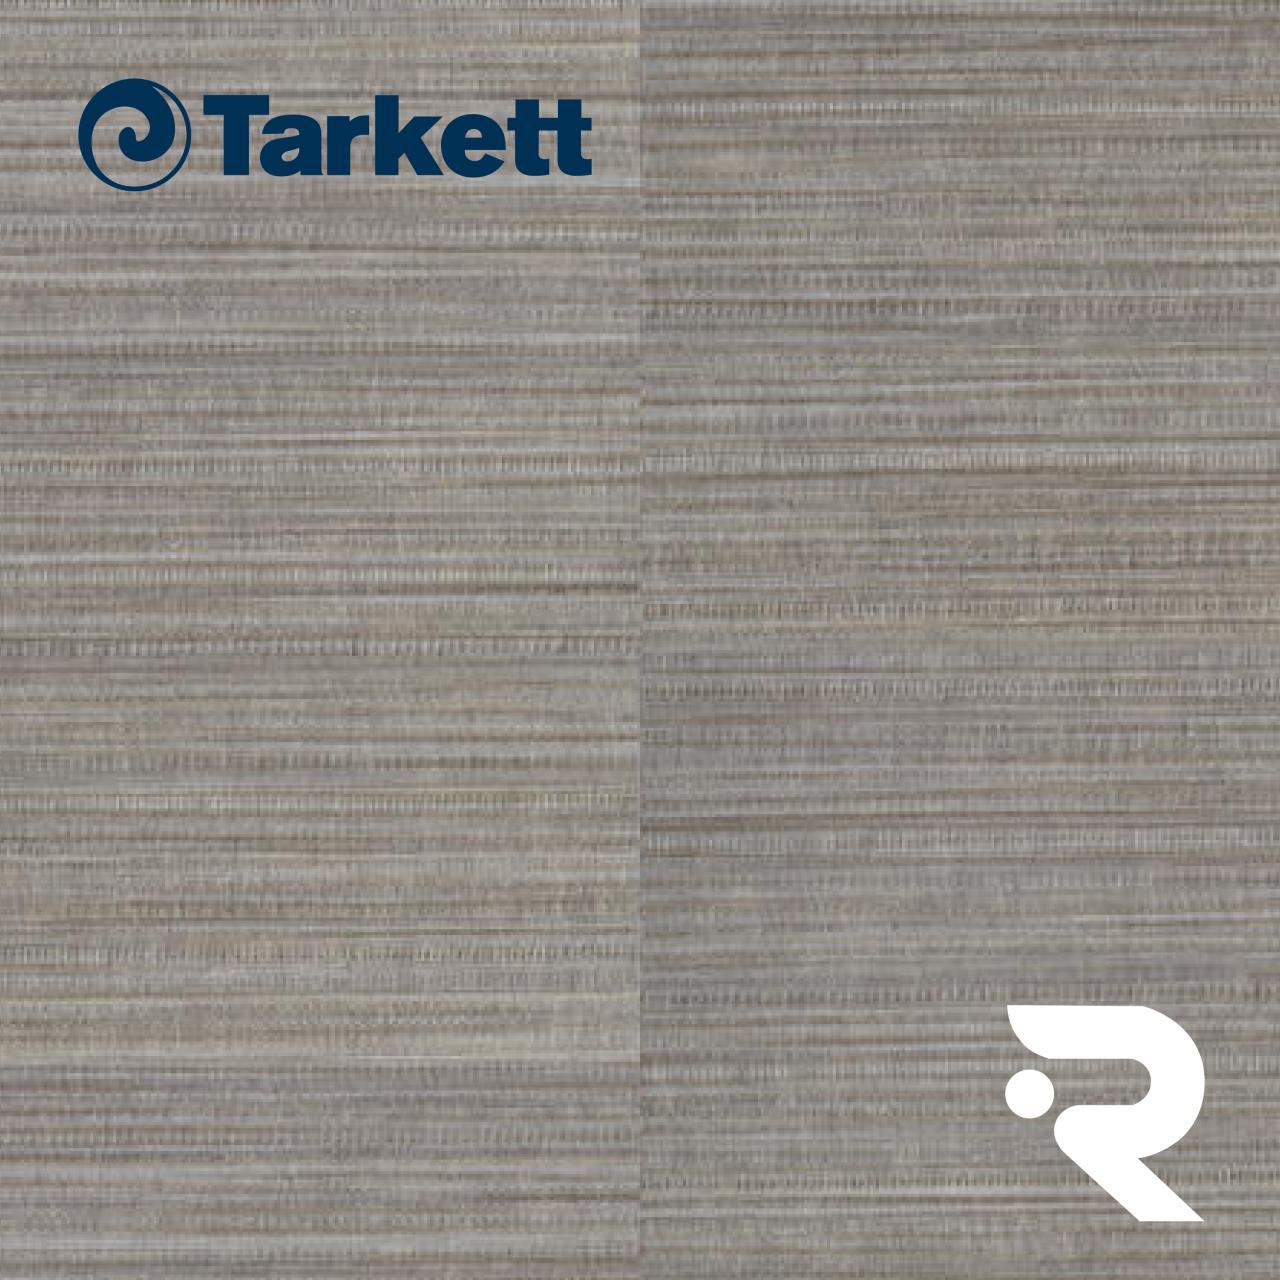 🌳 ПВХ плитка Tarkett | LOUNGE - FABRIC | Art Vinyl | 457 x 457 мм